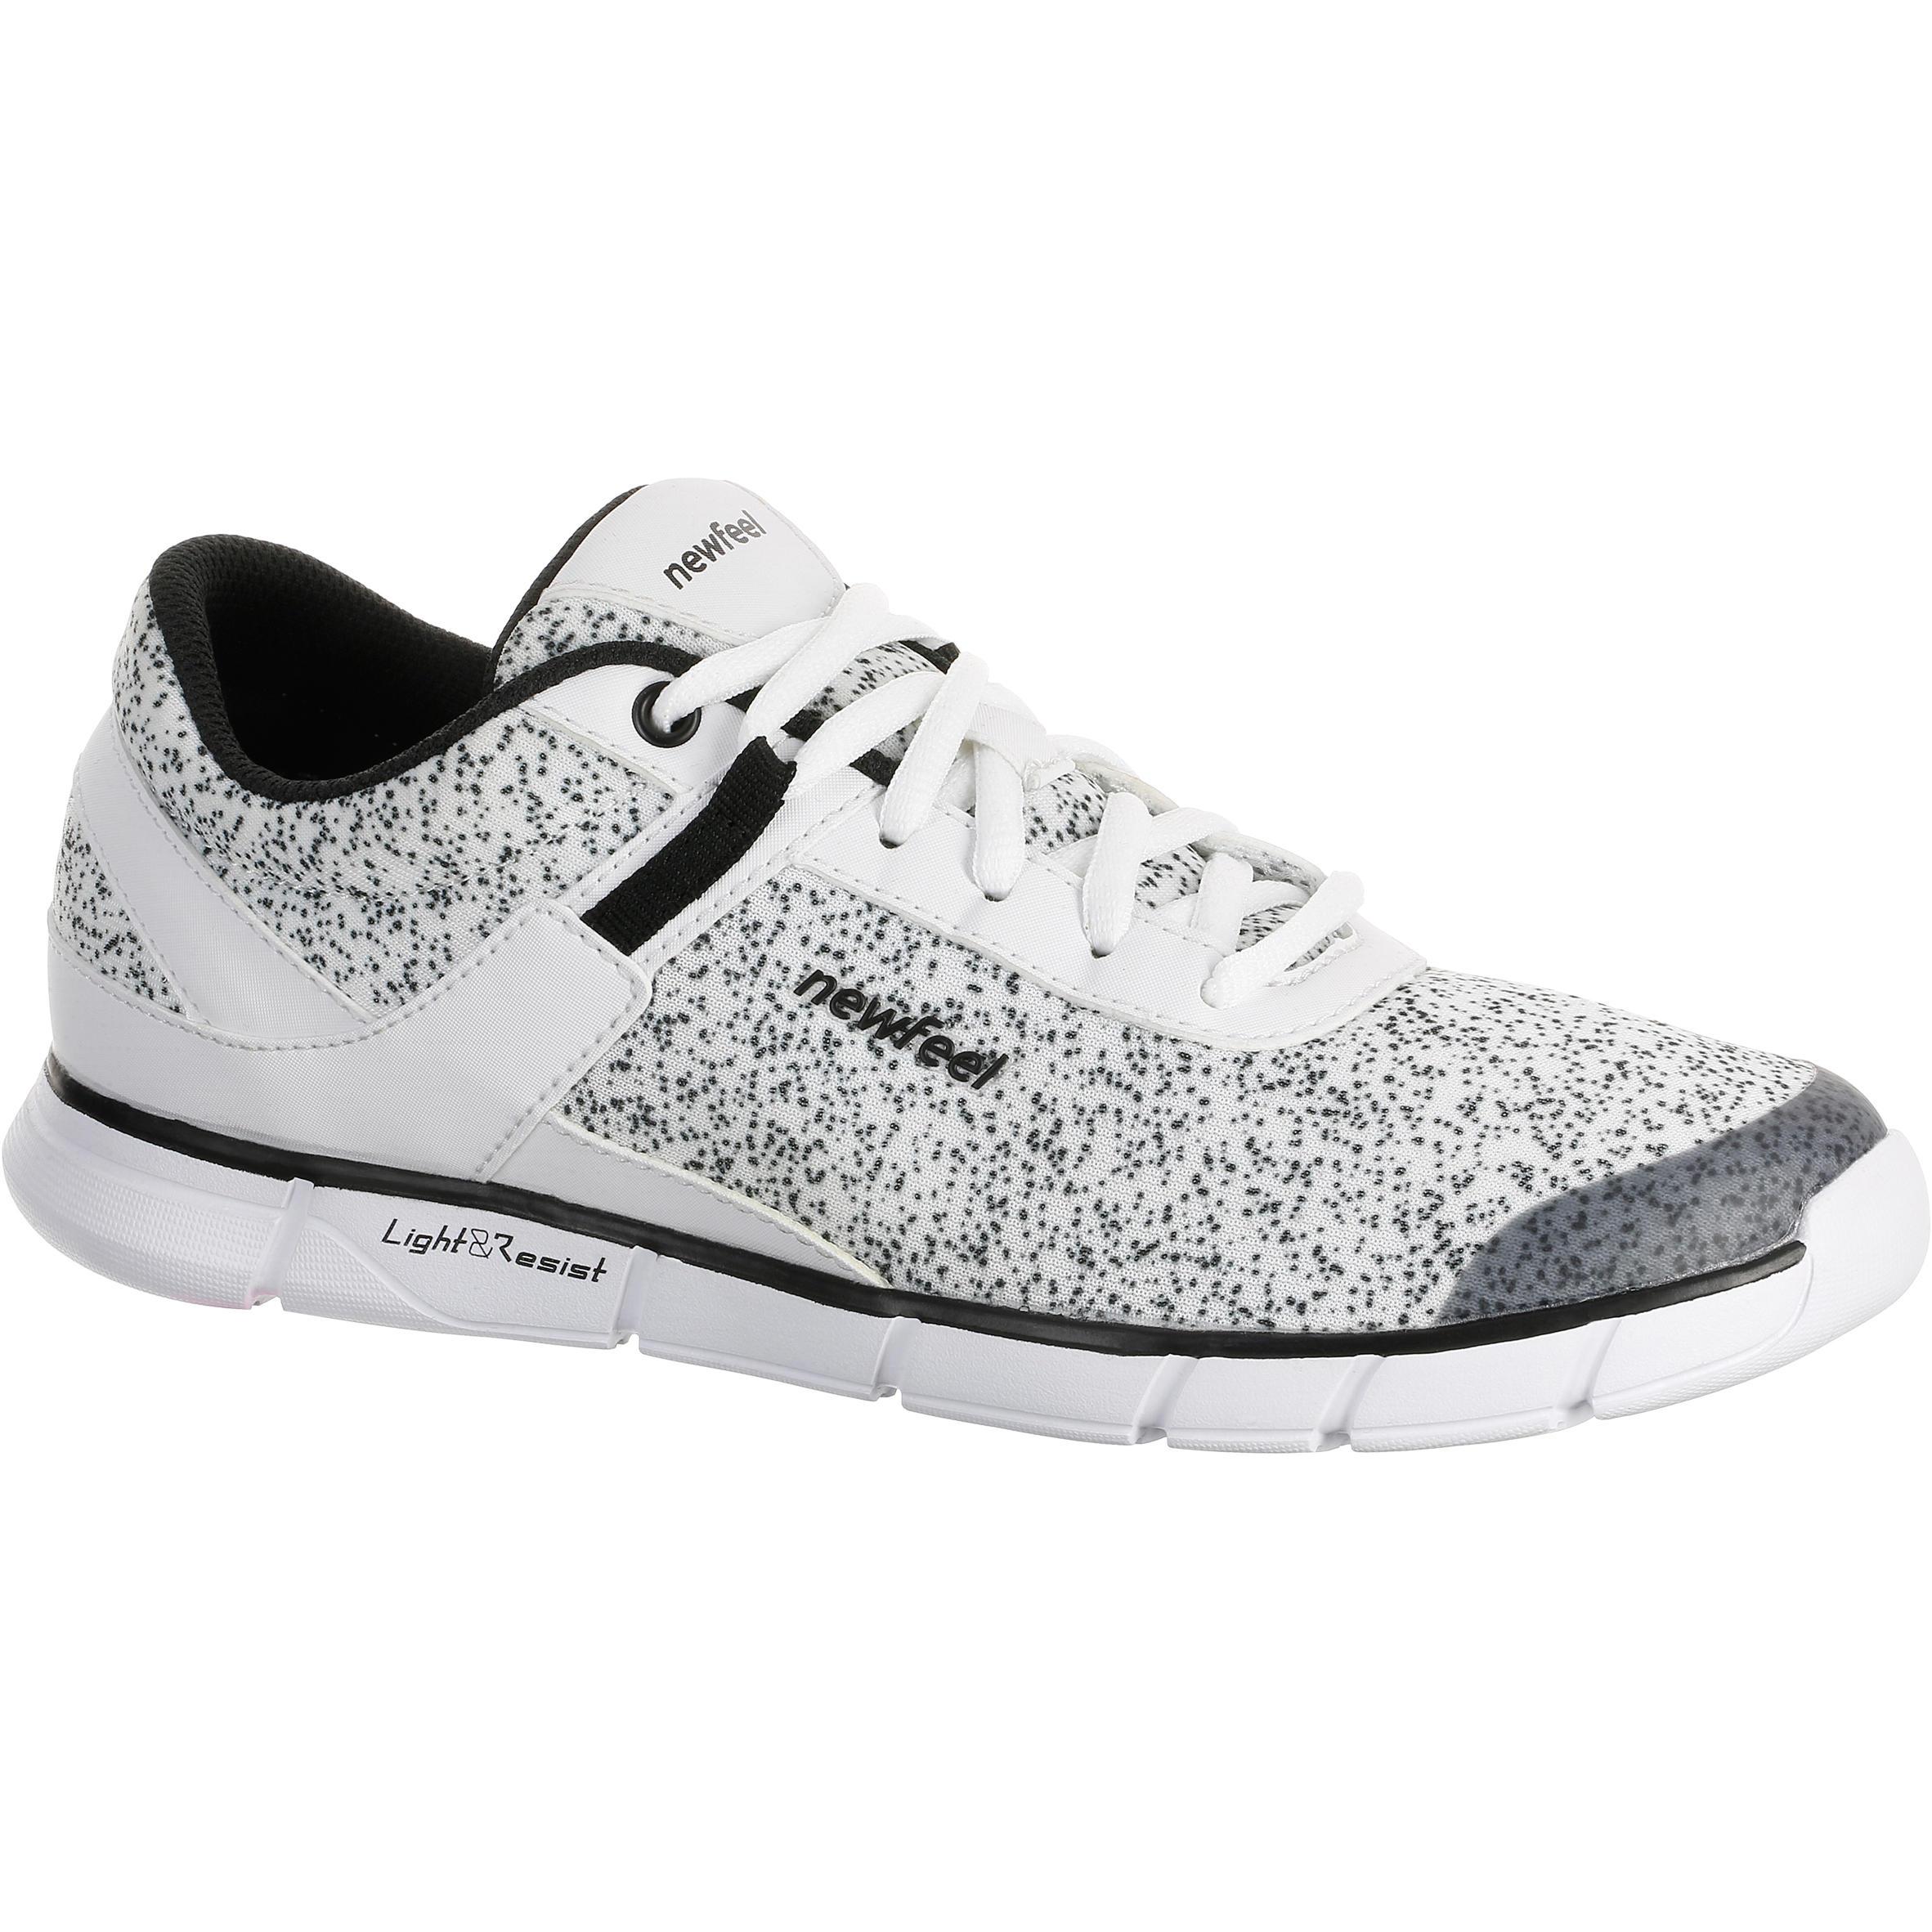 NEWFEEL Chaussures marche sportive femme Soft 540 blanc moucheté - NEWFEEL - 38